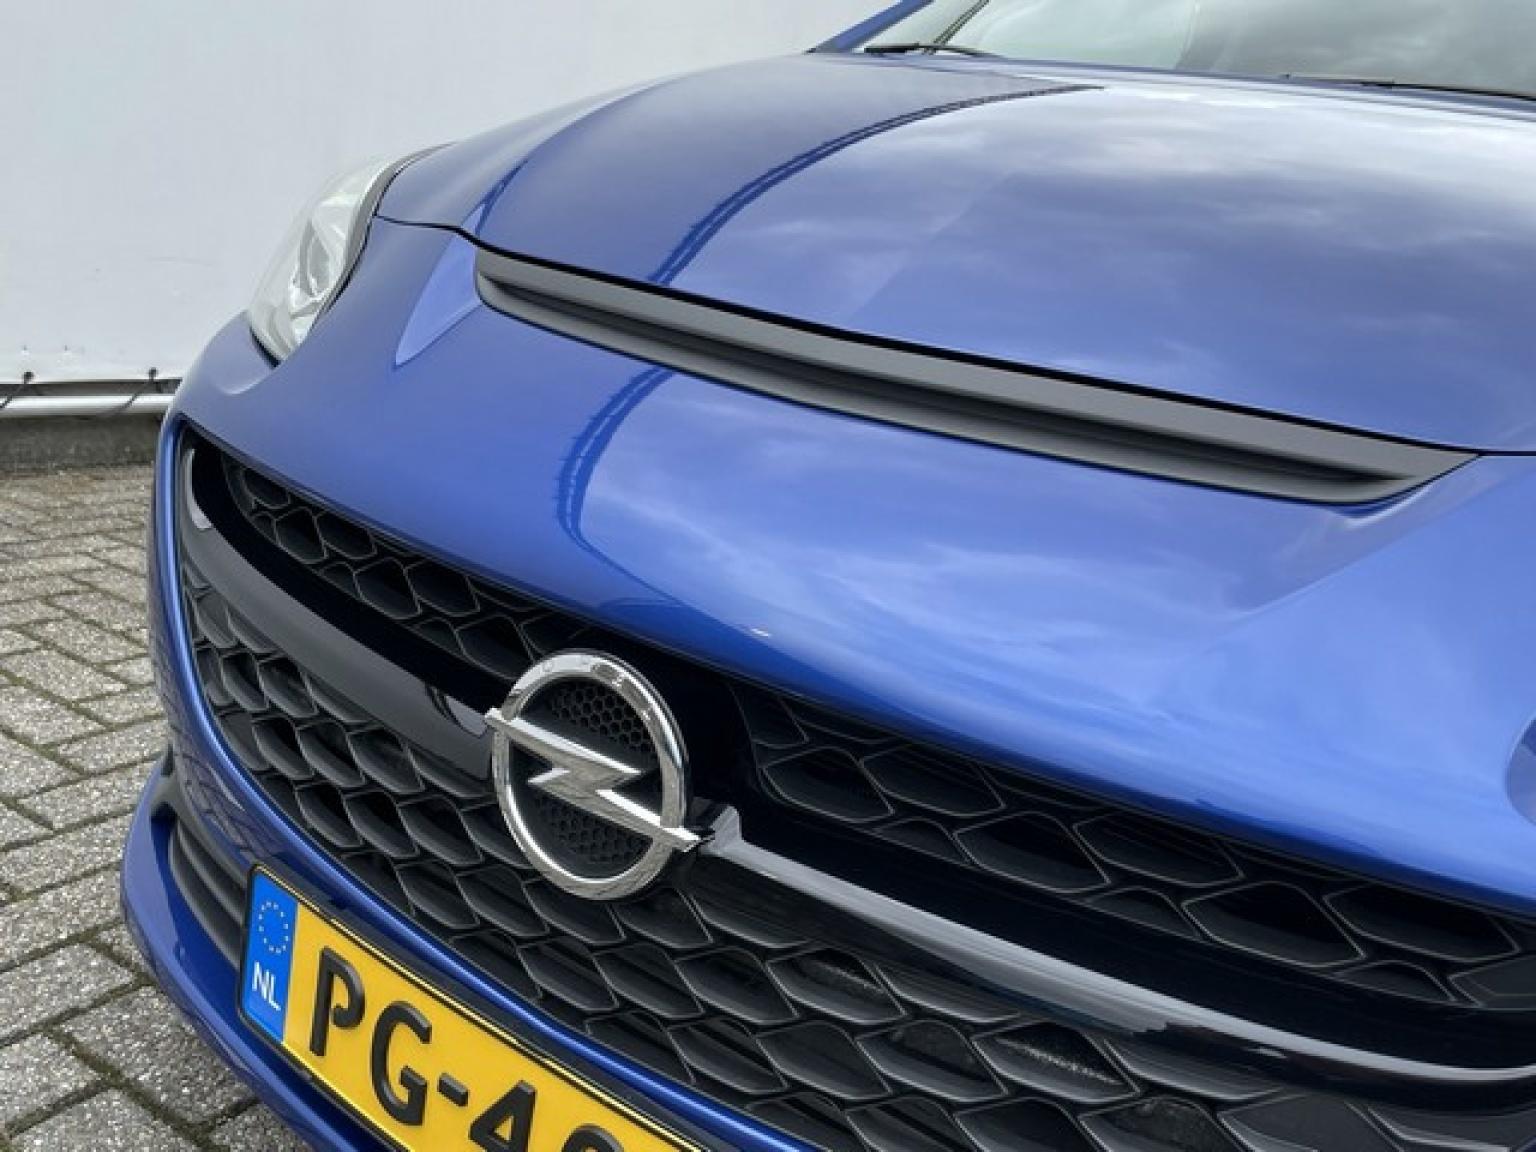 Opel-Corsa-23